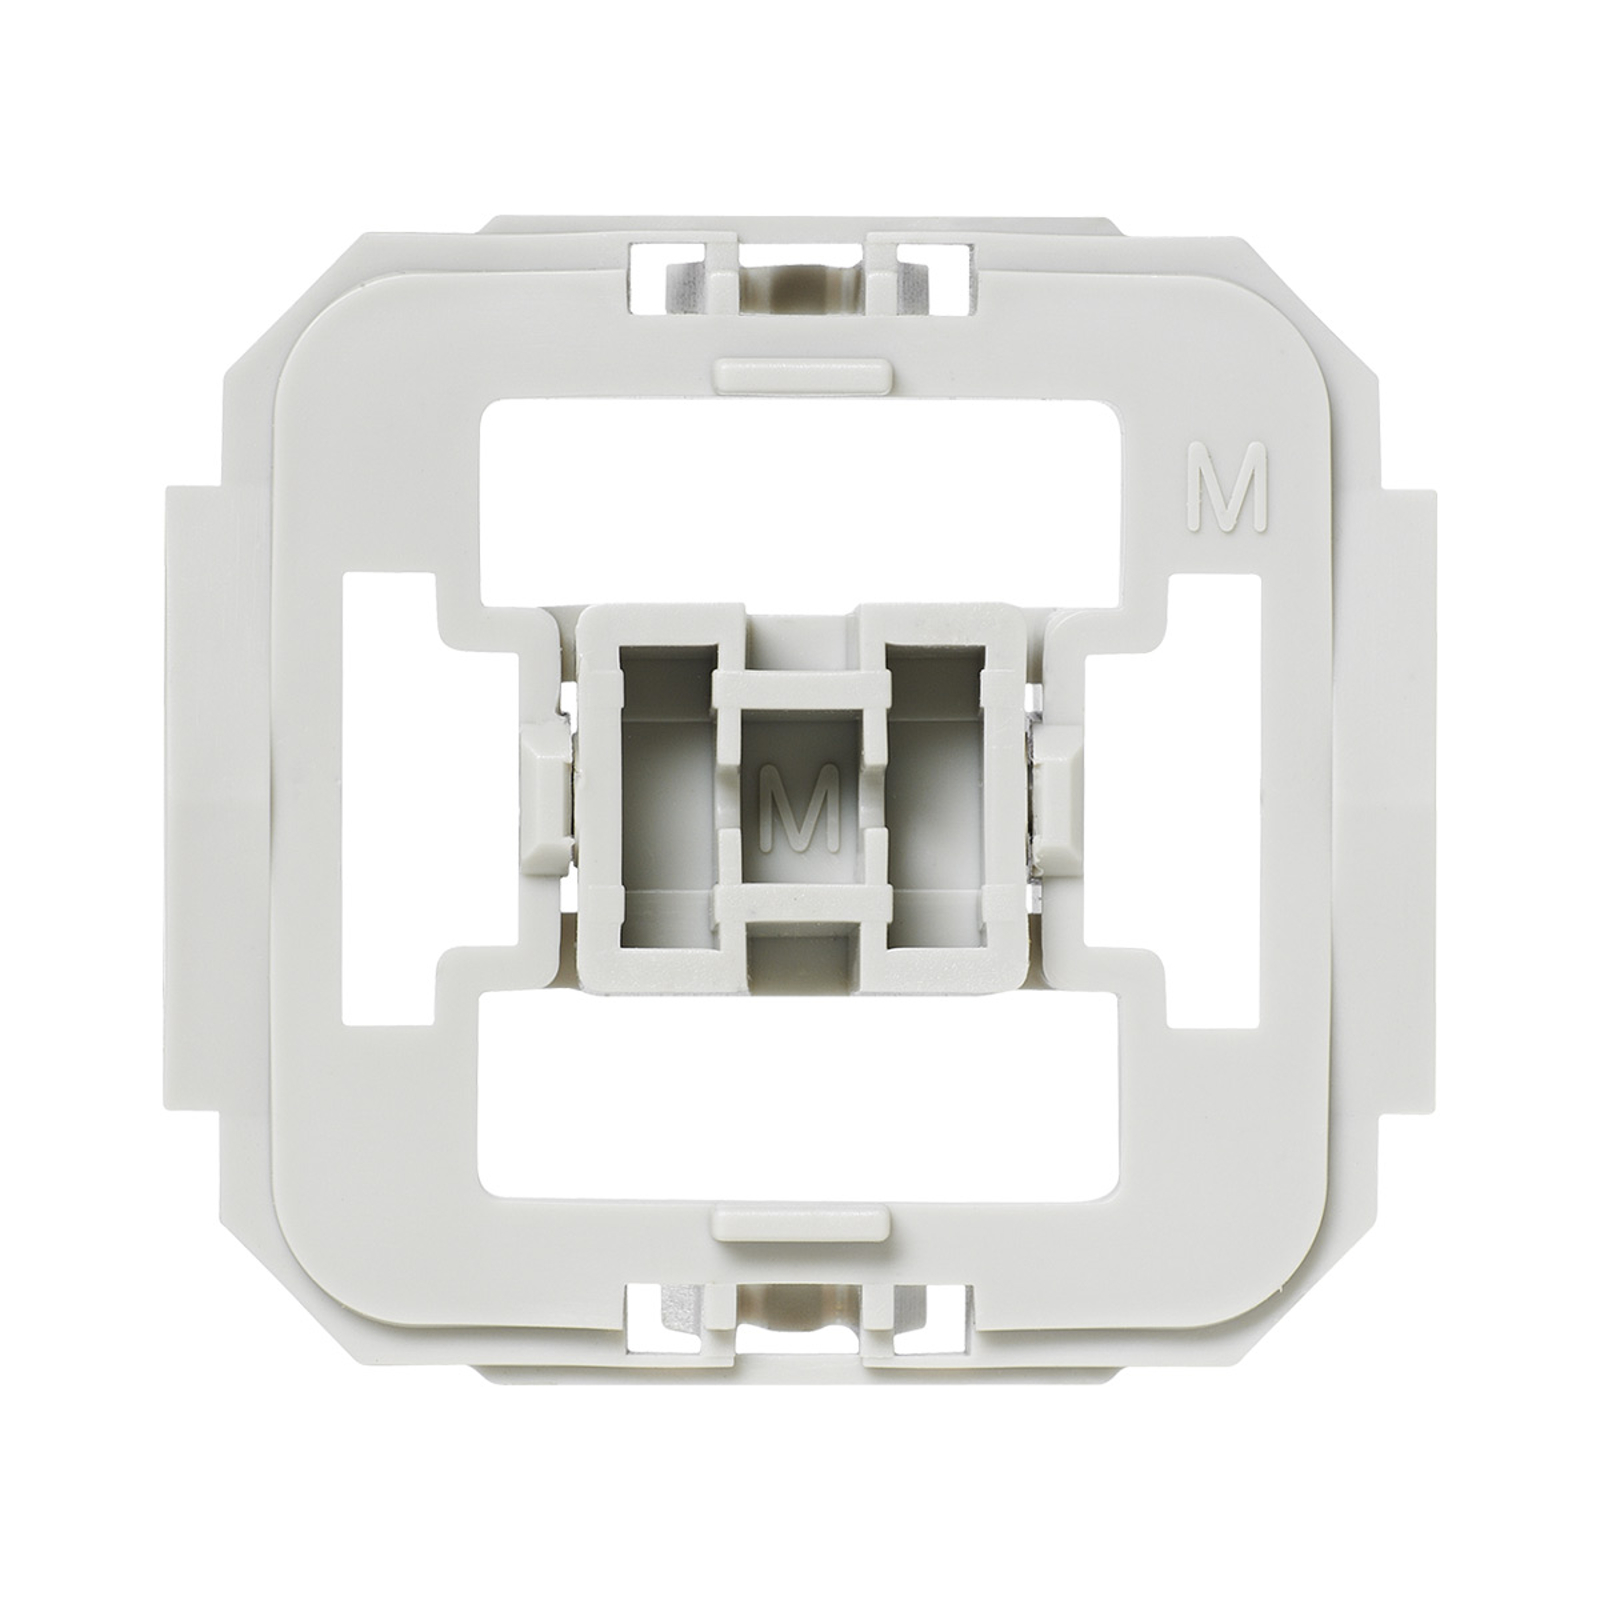 Homematic IP adaptador para interruptor Merten 20x